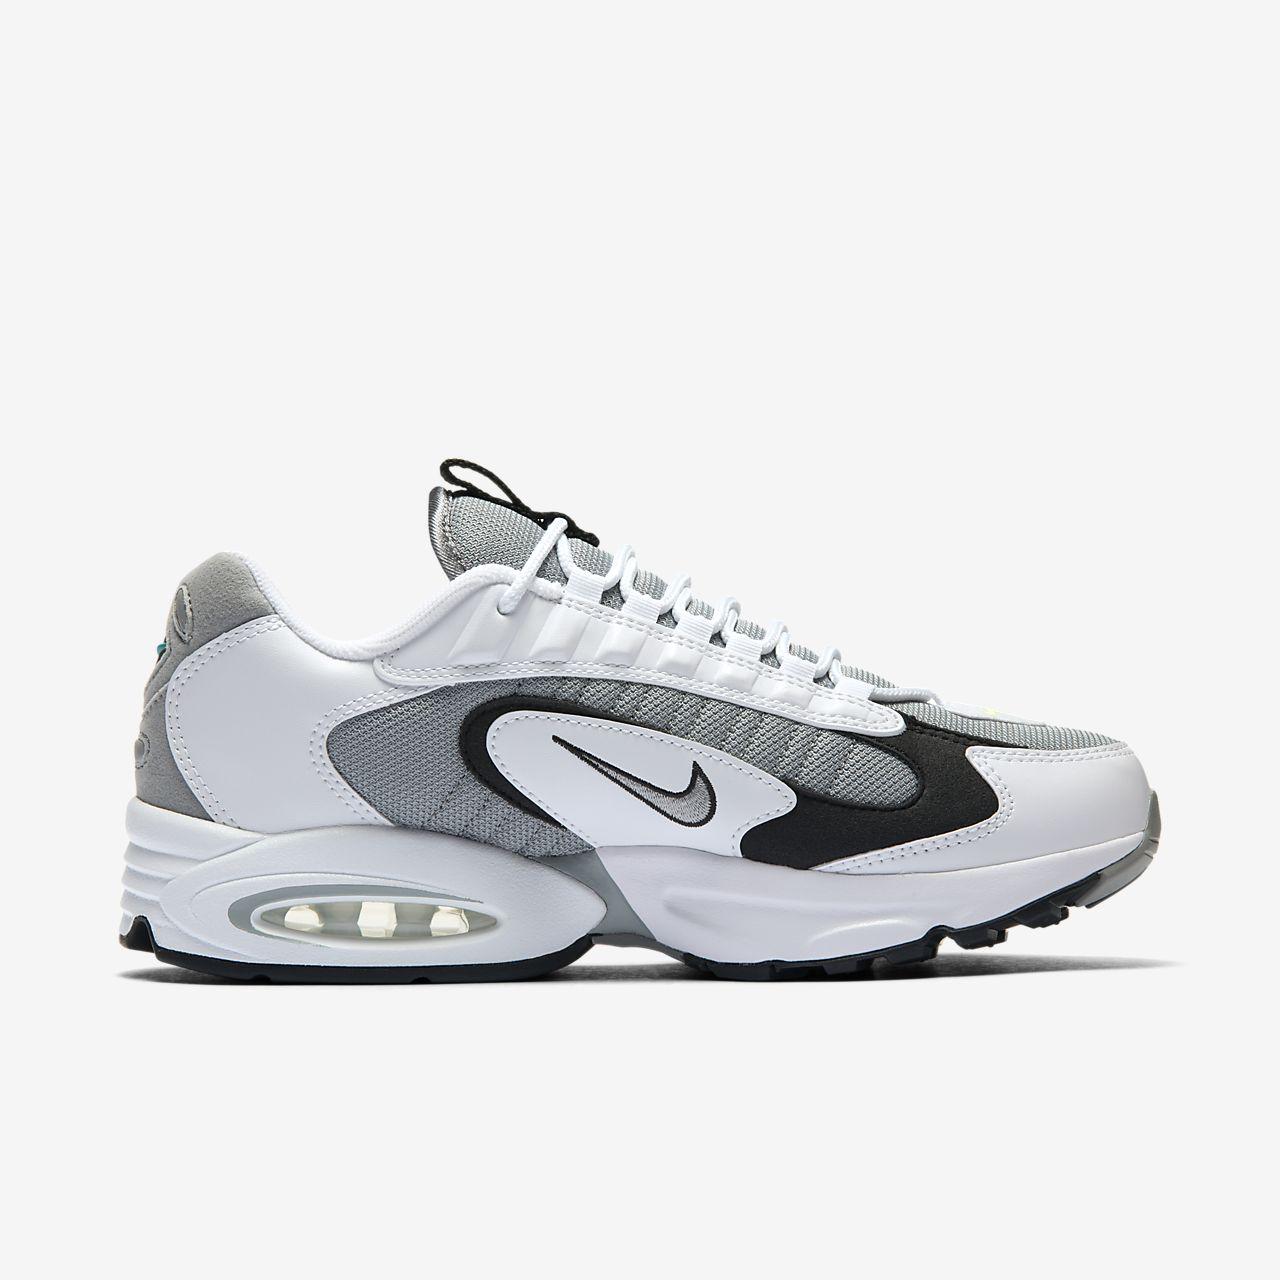 Sapatilhas Nike Air Max Triax 96 para homem